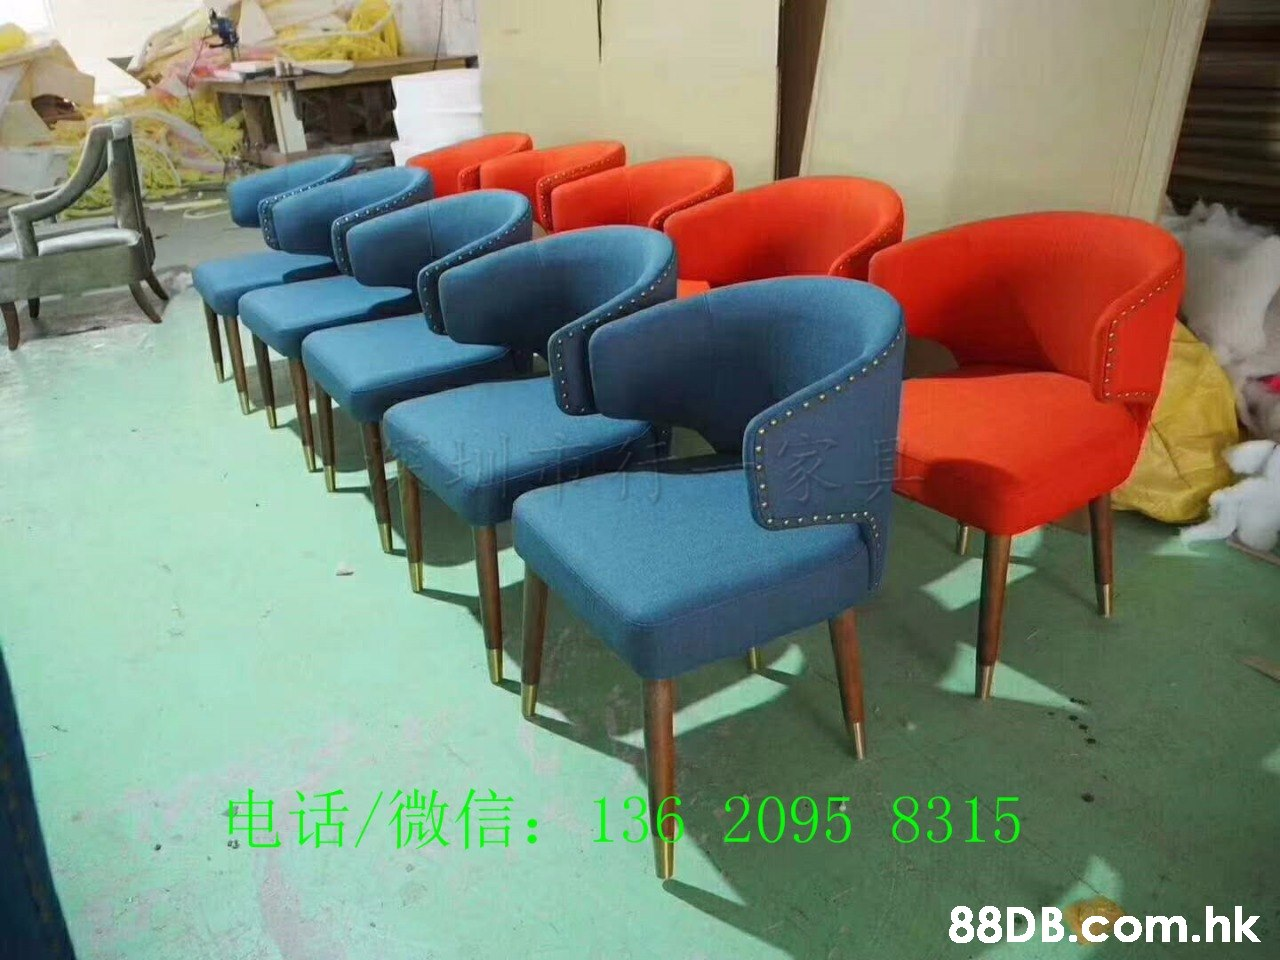 tu i/ 136 2095 8315 .hk  Chair,Furniture,Room,Table,Folding chair